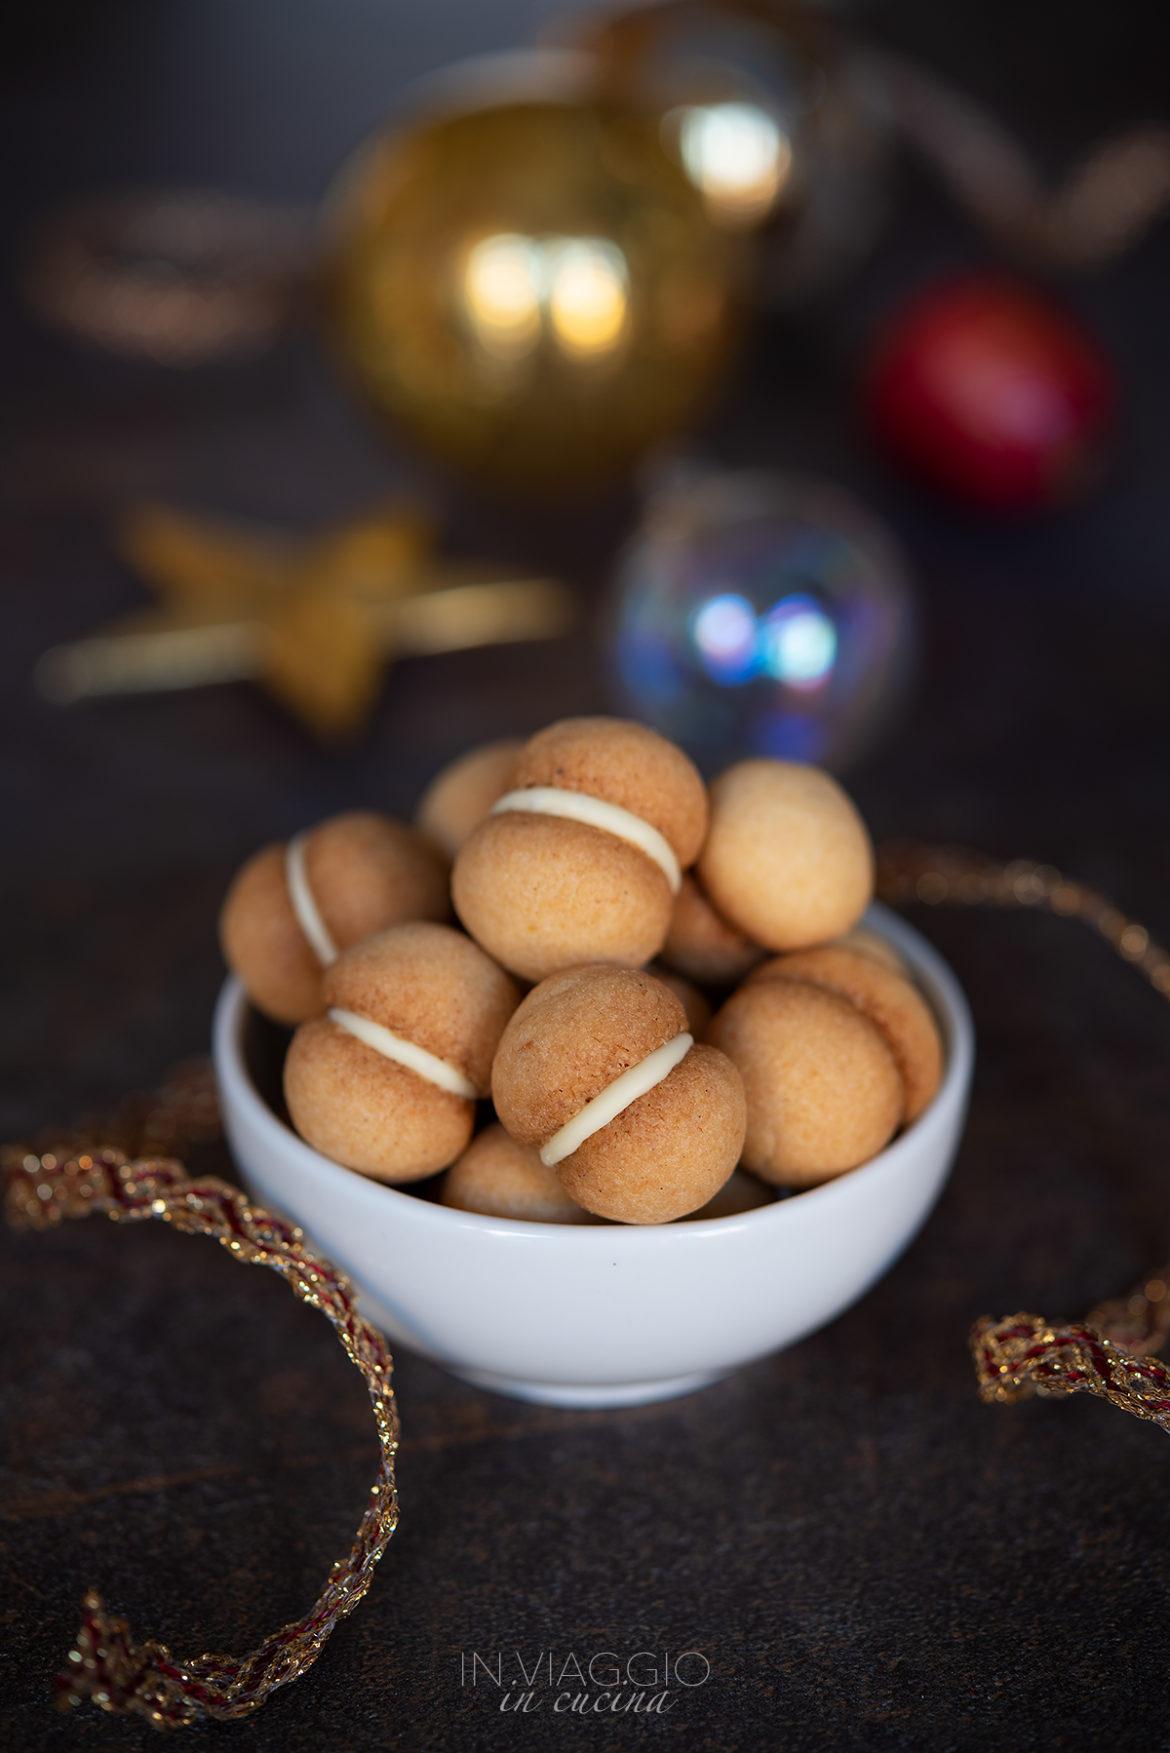 coconut baci di dama with white chocolate